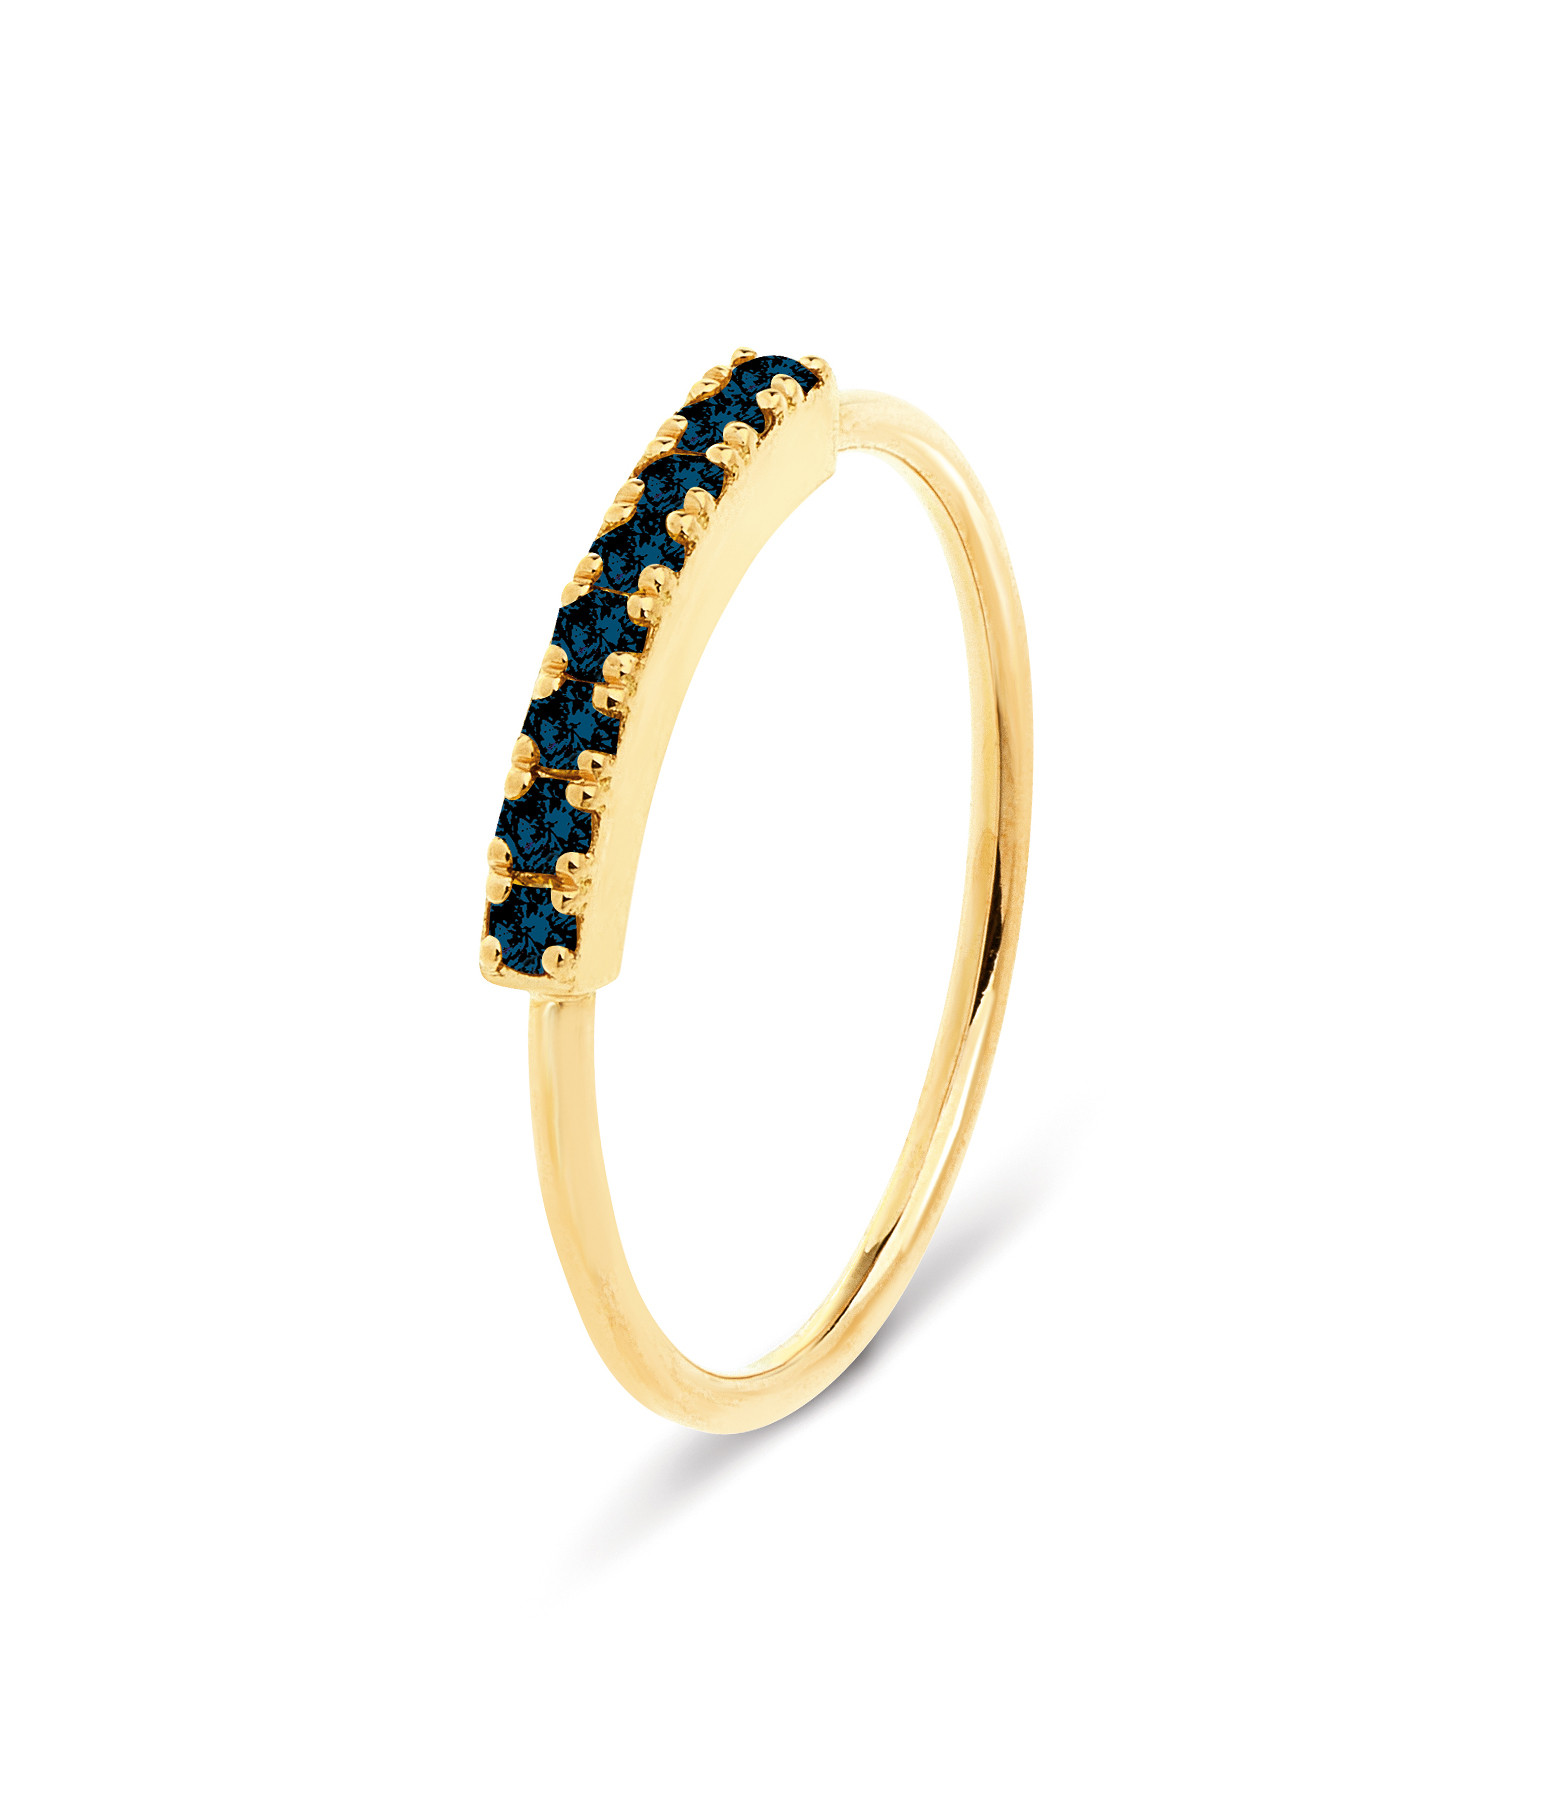 NAVA JOAILLERIE - Bague Demi-Alliance Hash Diamants Noirs Or Jaune